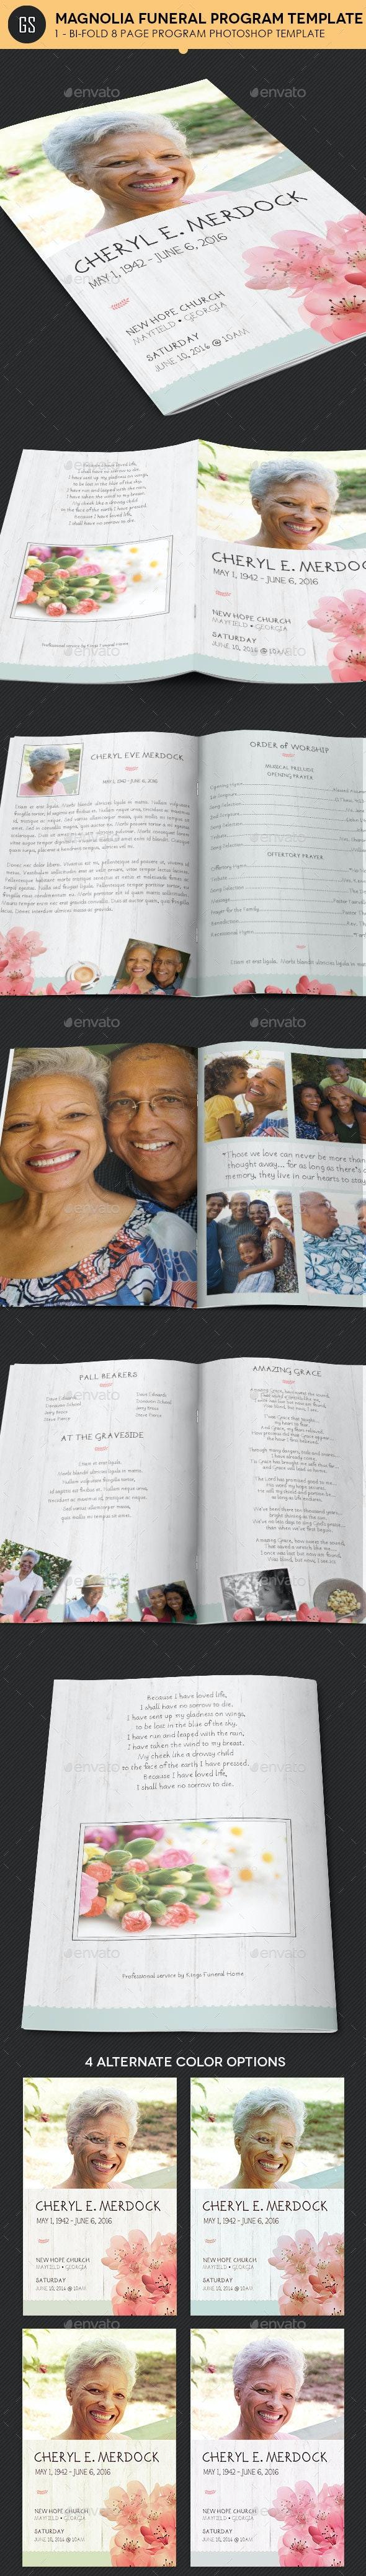 Magnolia Funeral Program Template - Informational Brochures